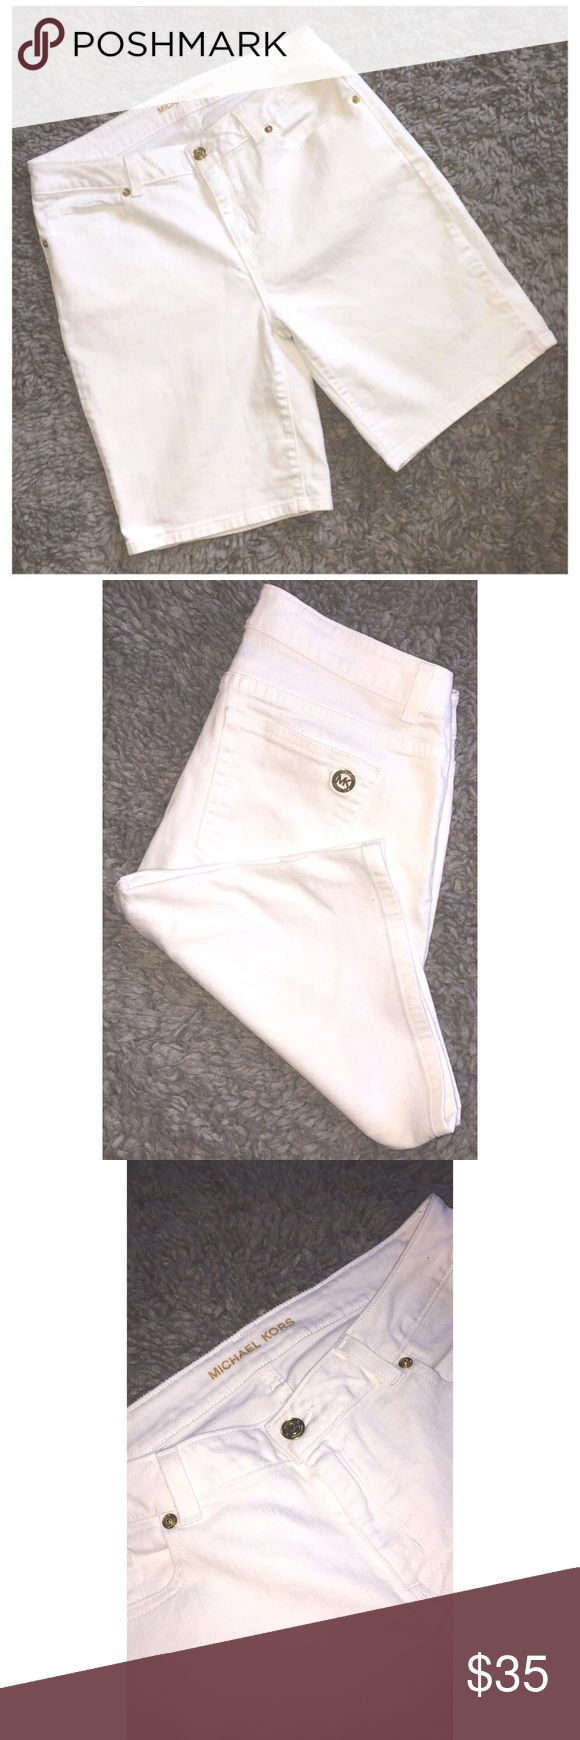 Michael Kors 🏖 Bermuda Shorts Michael Kors Bermuda Shorts - Excellent Condition - Gold Detail Michael Kors Shorts Bermudas